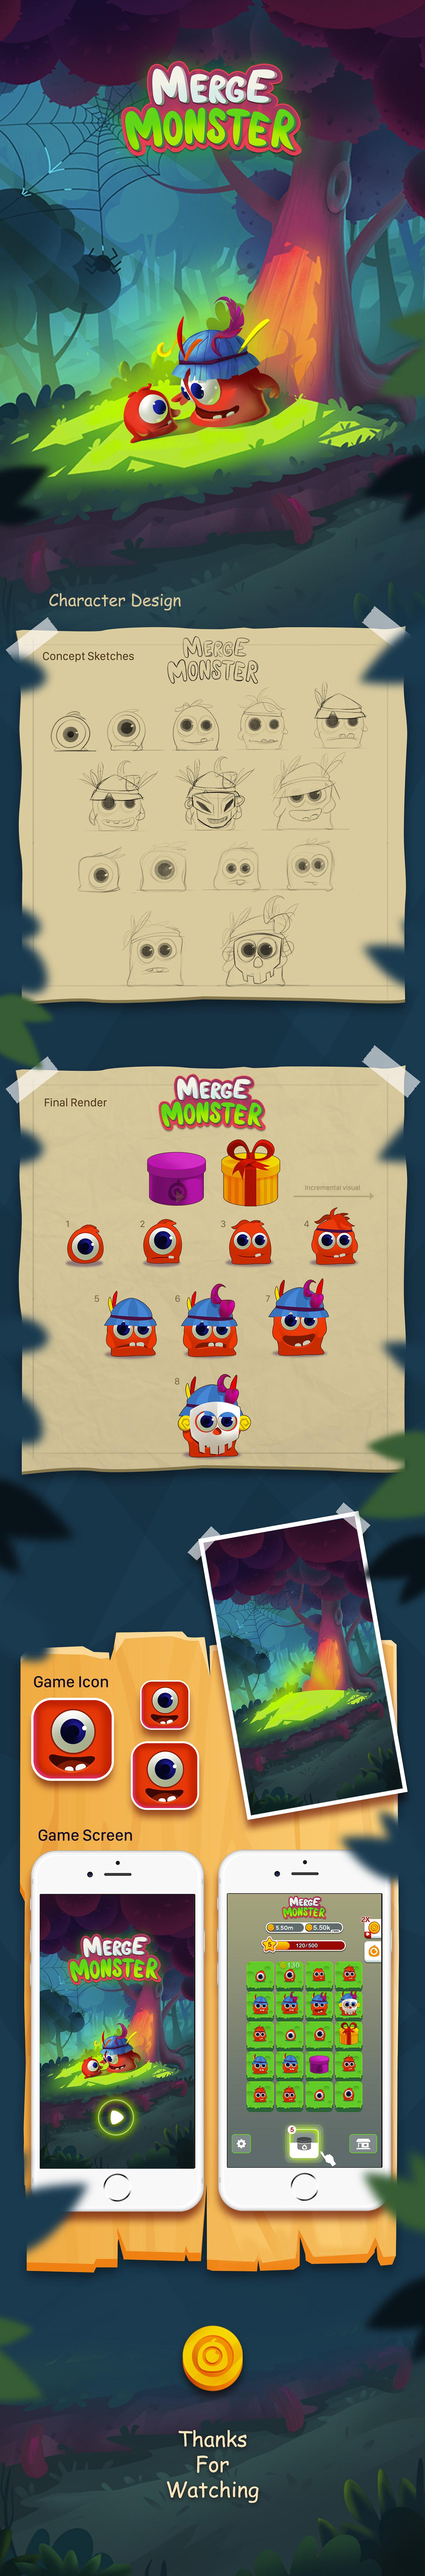 game design  ui design Game Art merge monster concept art ILLUSTRATION  2D art mobile games UI/UX